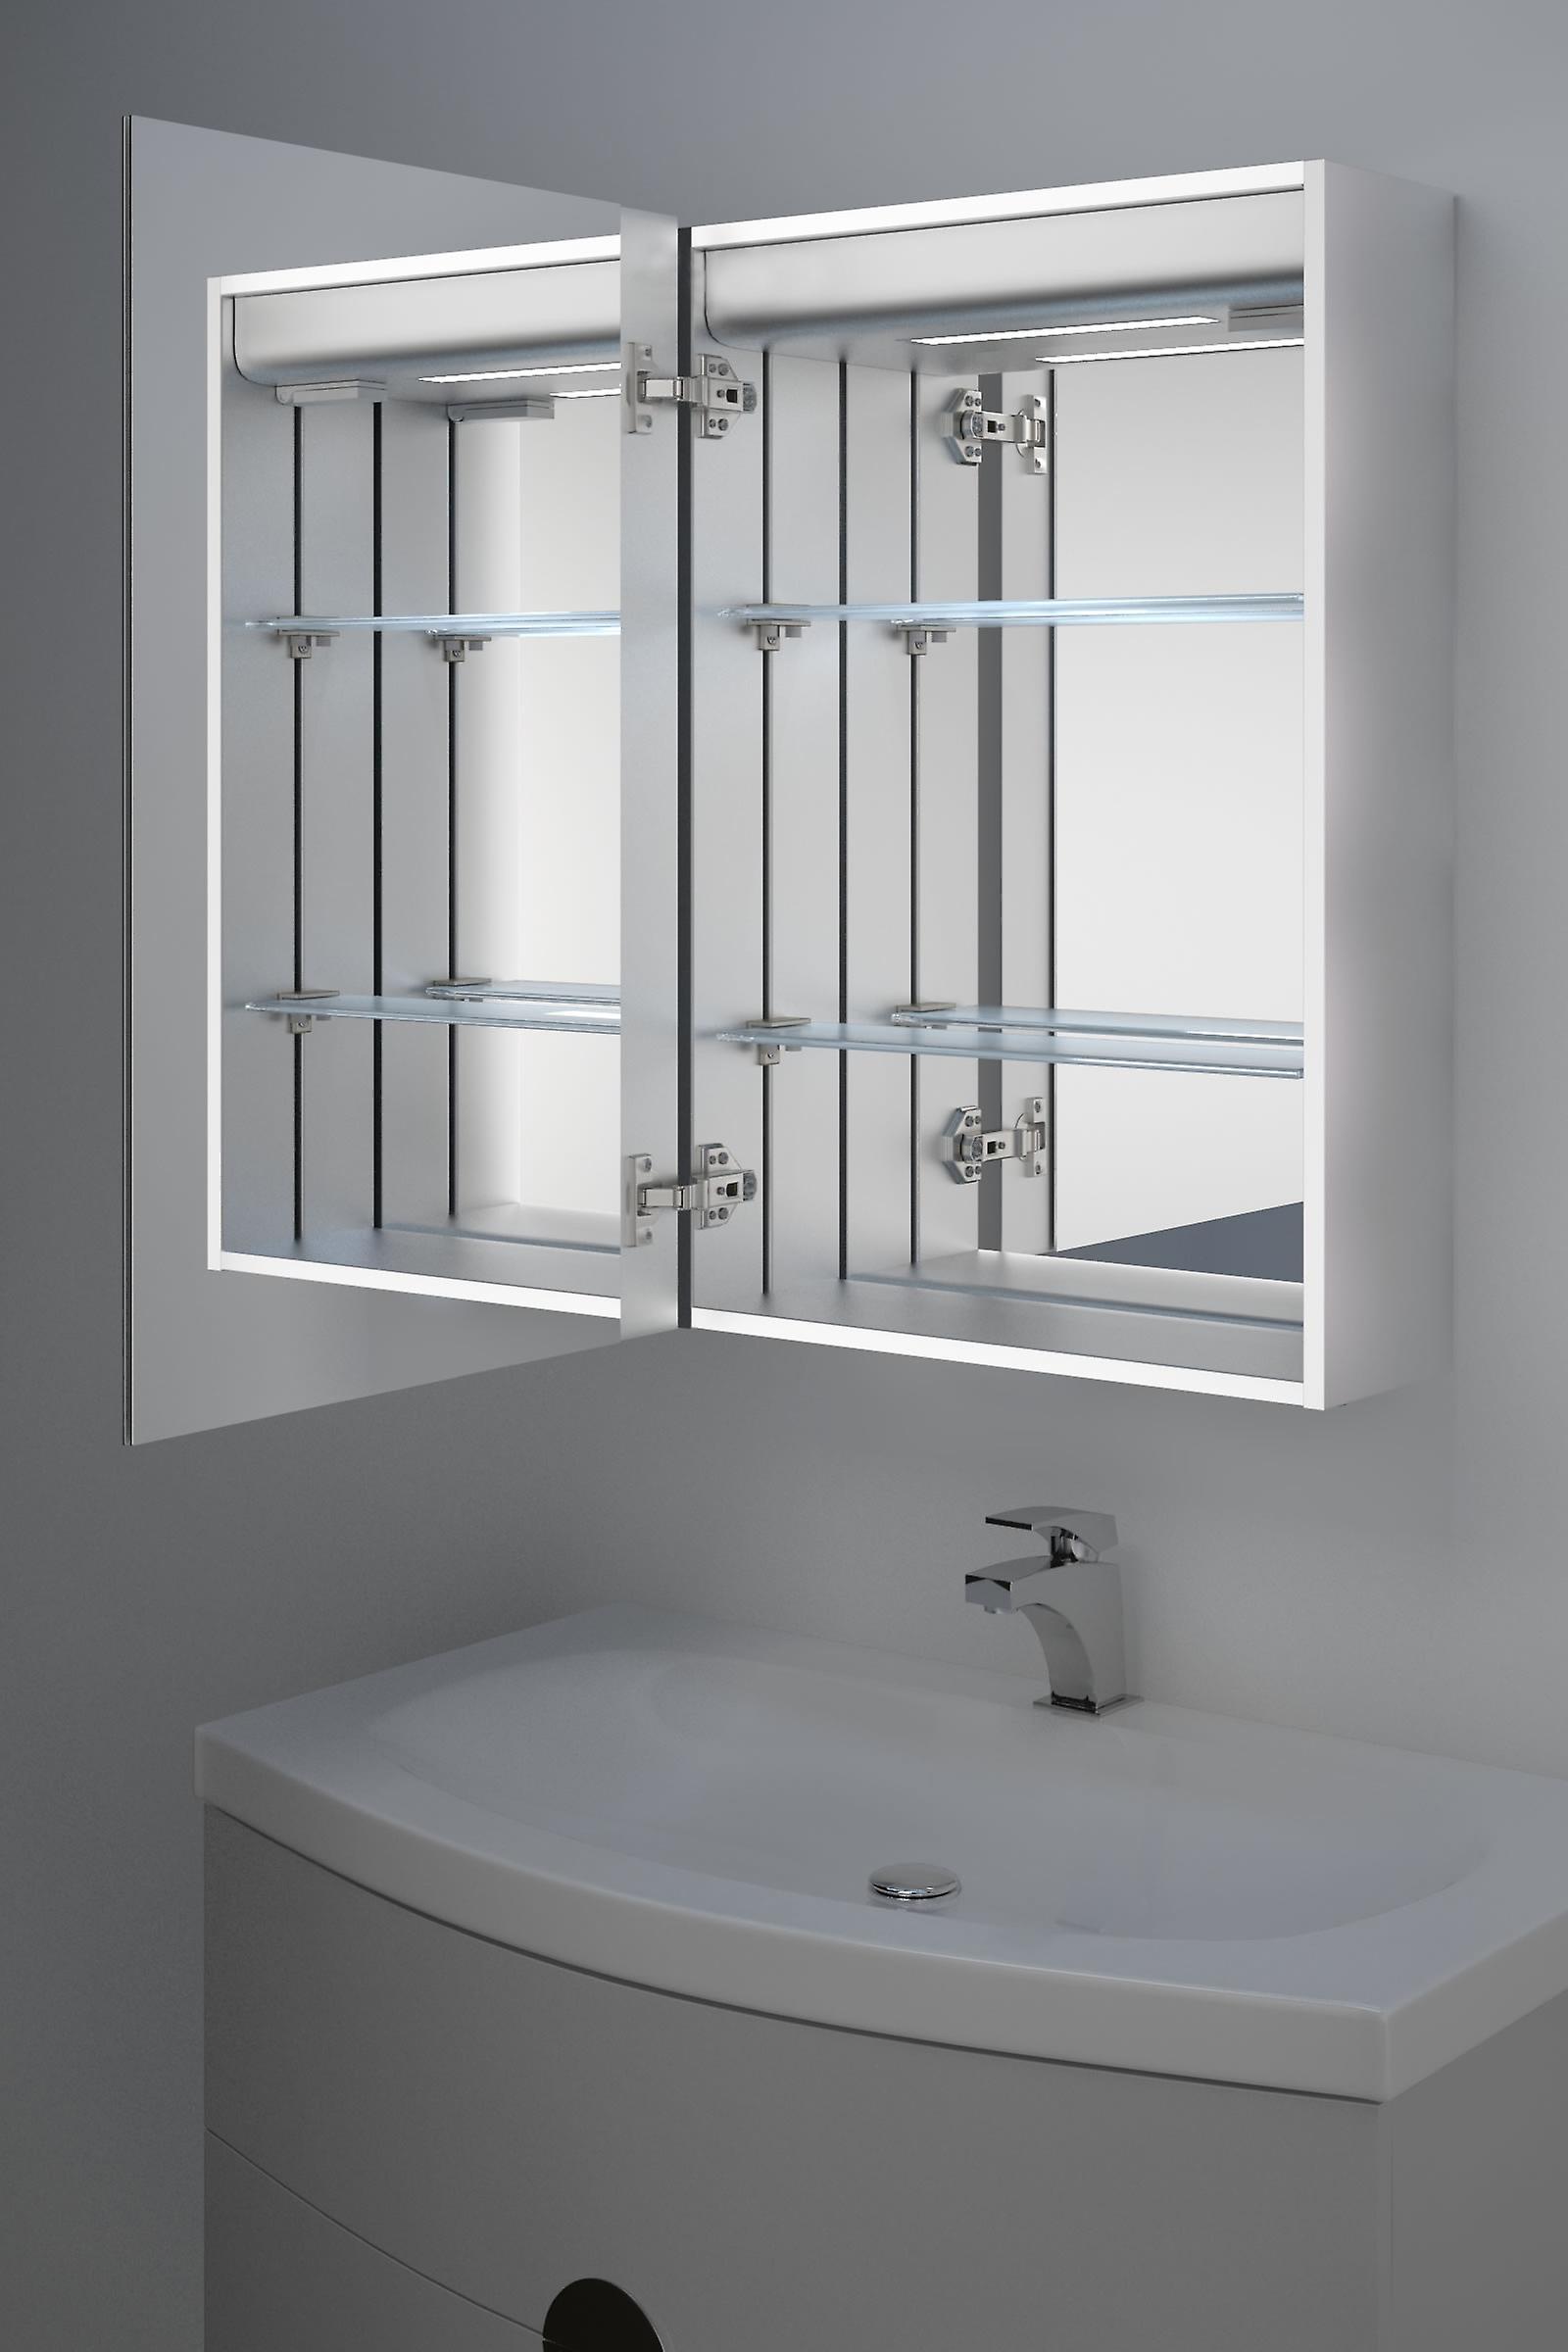 Balta LED Audio Bathroom Cabinet with Demister Pad, Shaver Socket